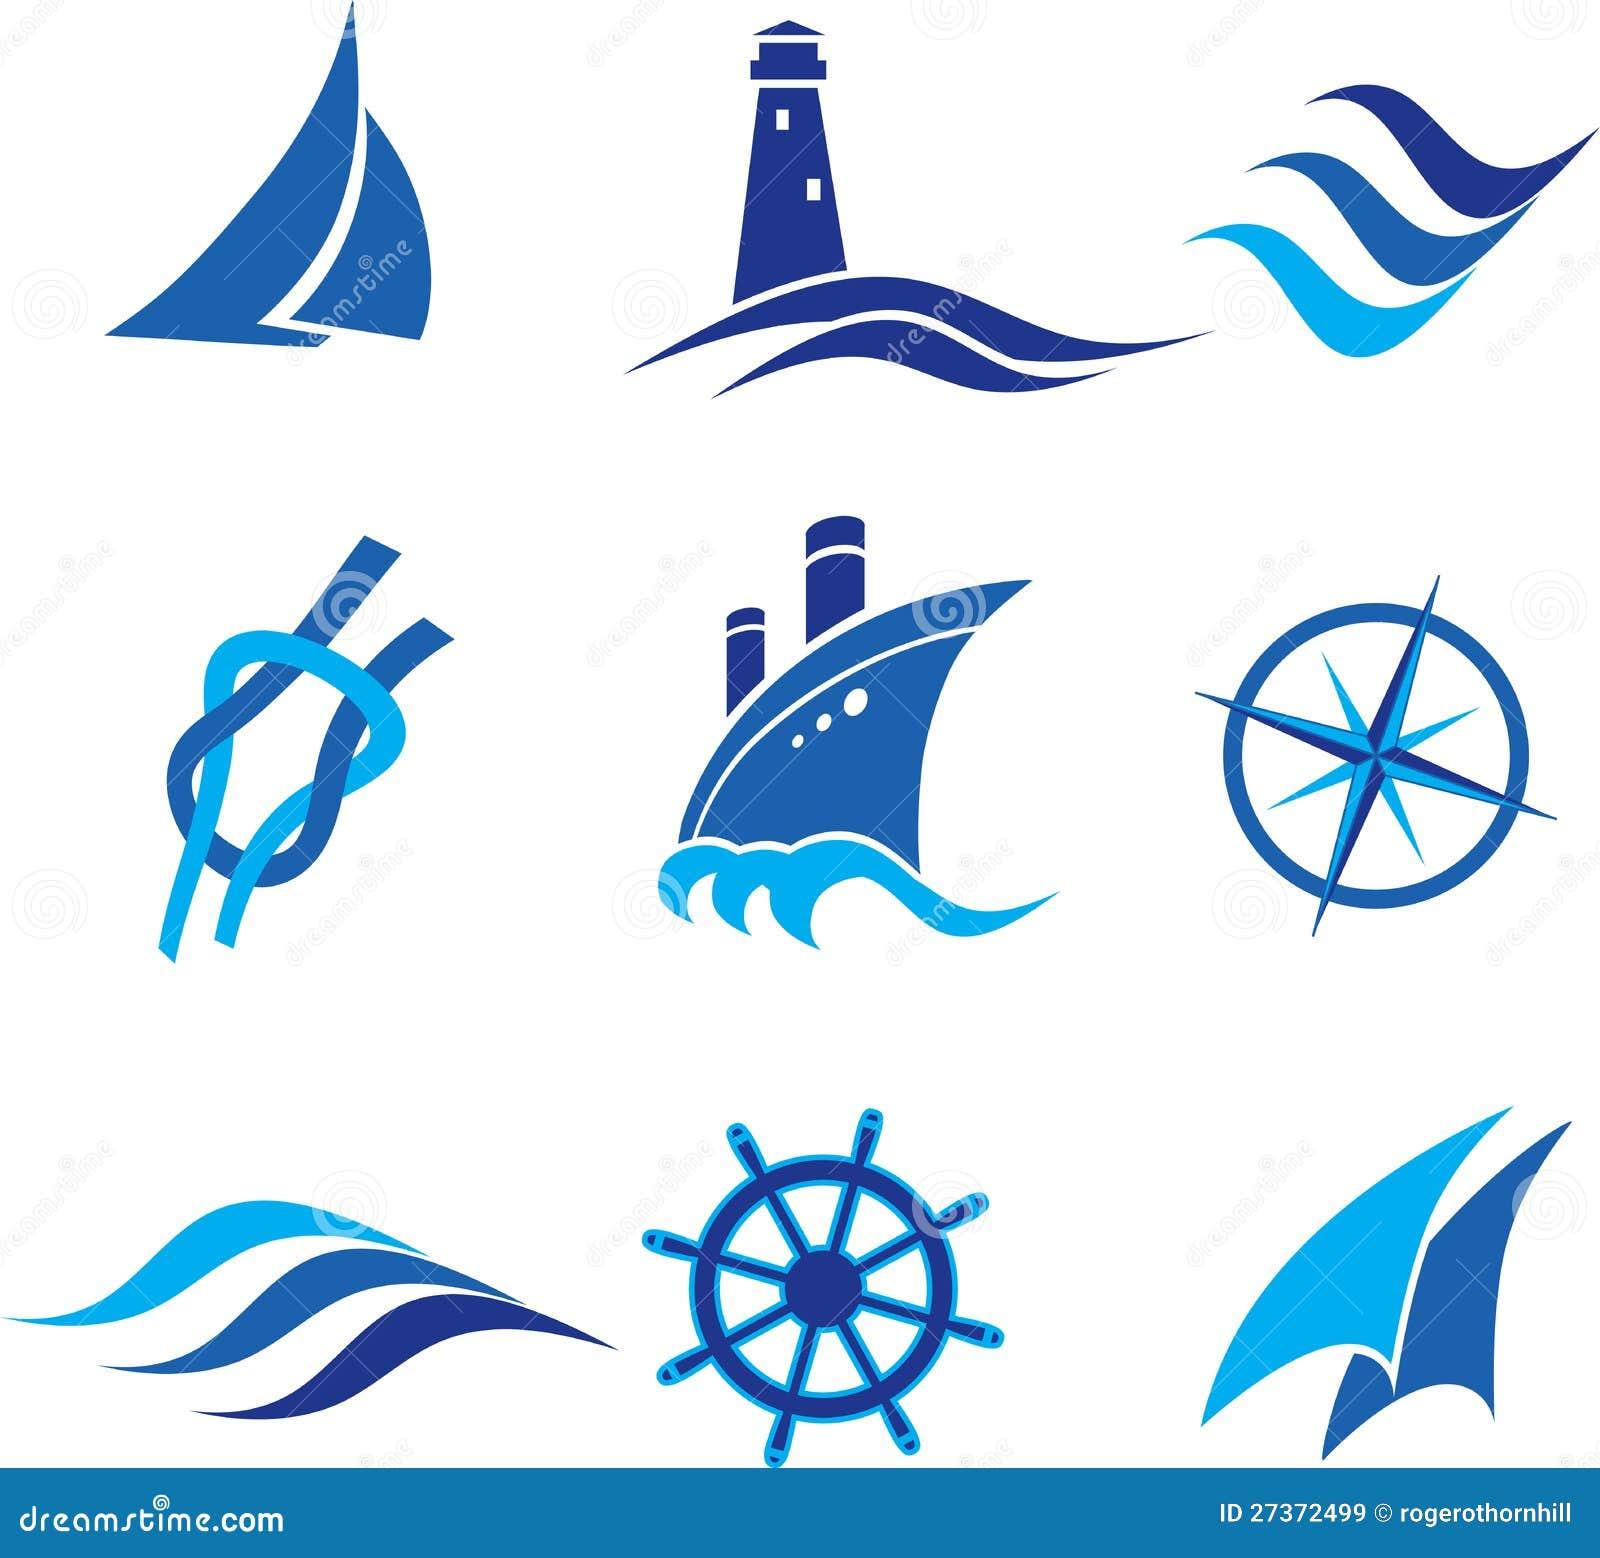 морские логотипы: